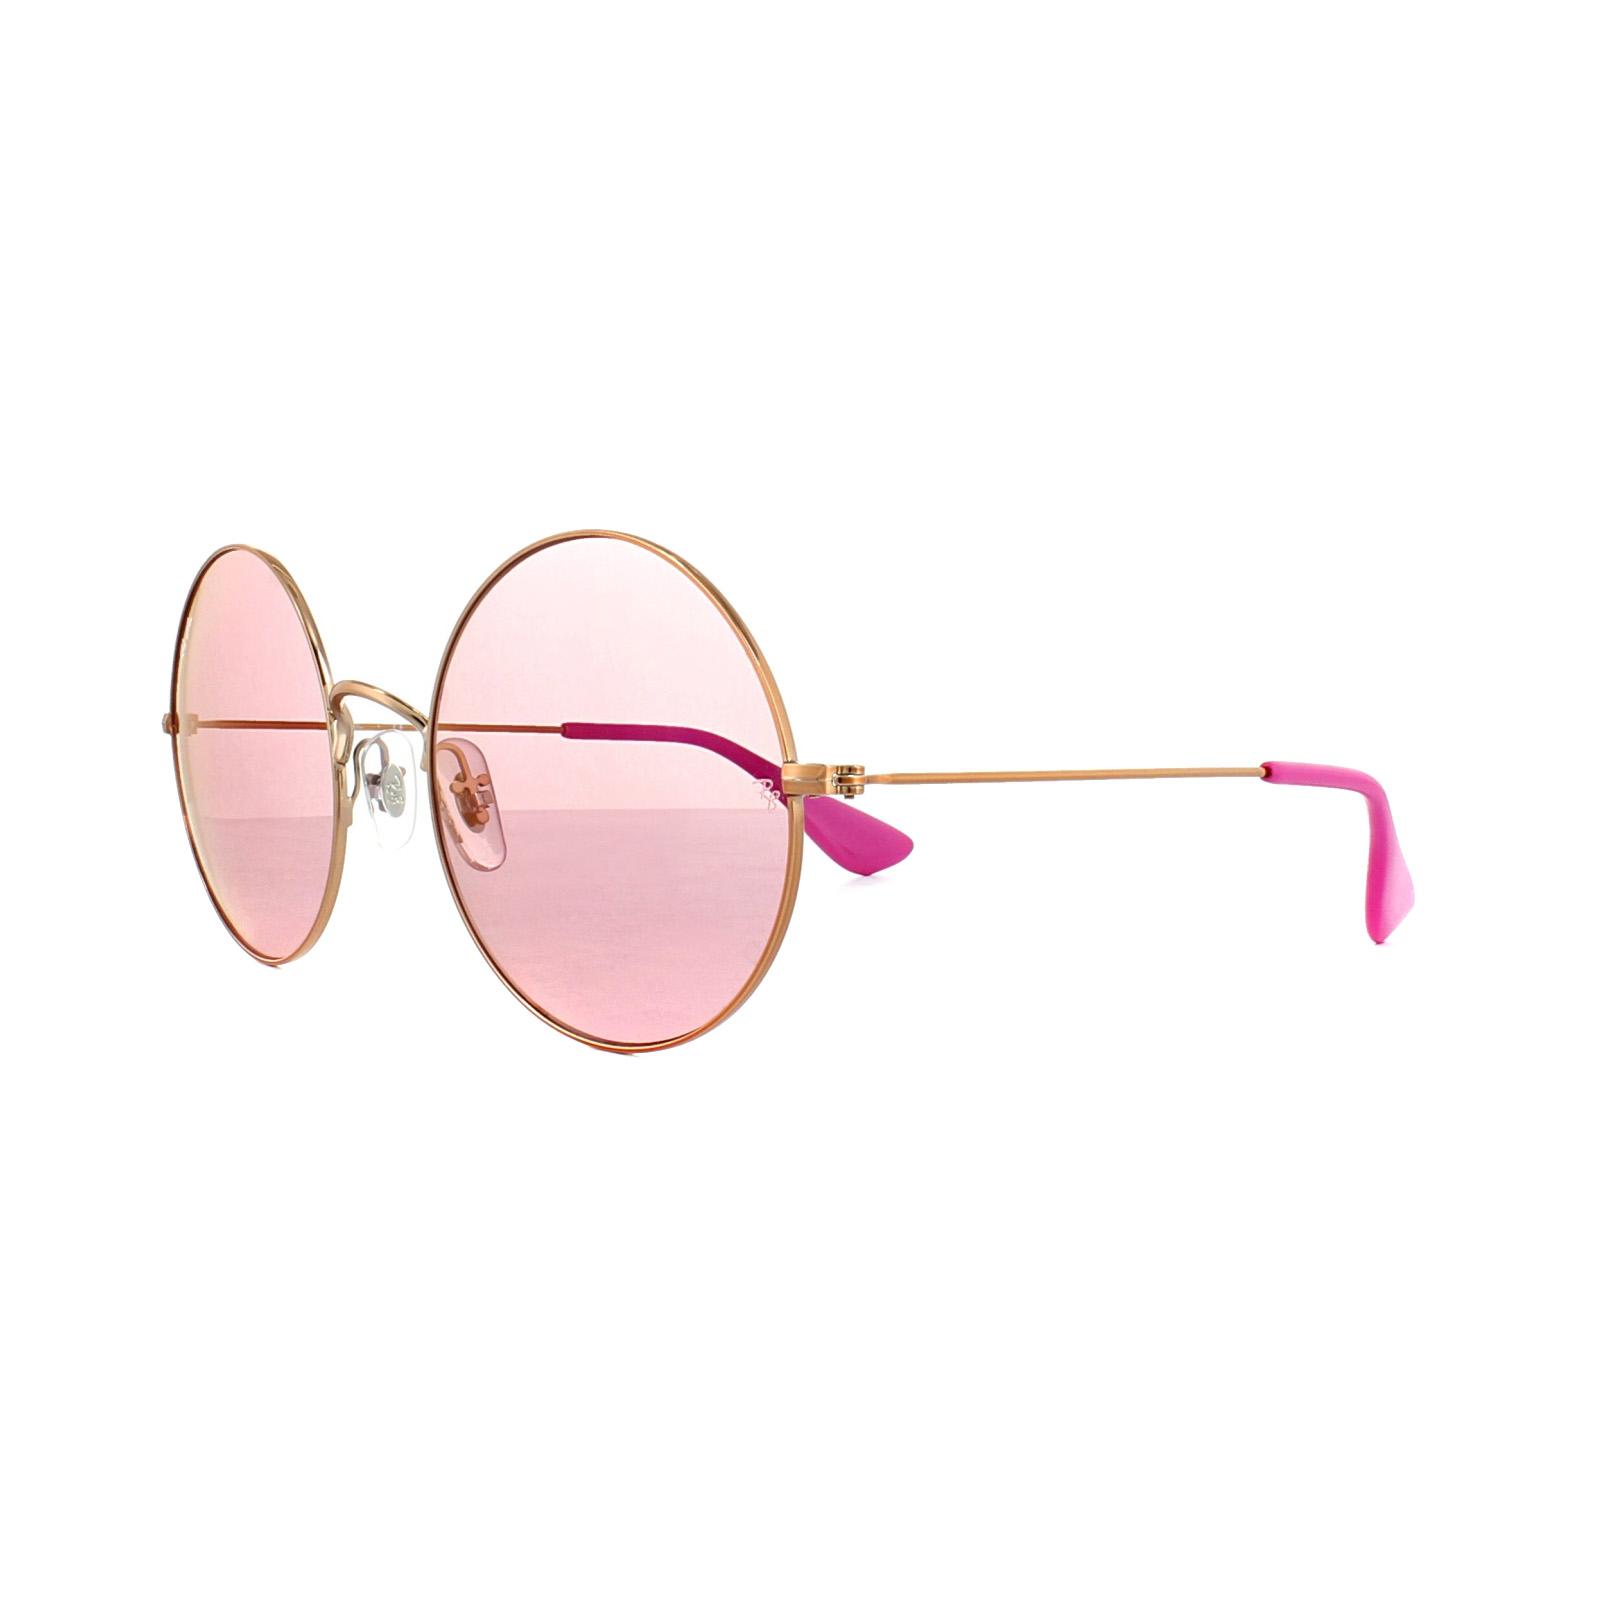 6a4543c502f Sentinel Ray-Ban Sunglasses Ja-Jo 3592 9035F6 Bronze Copper Pink